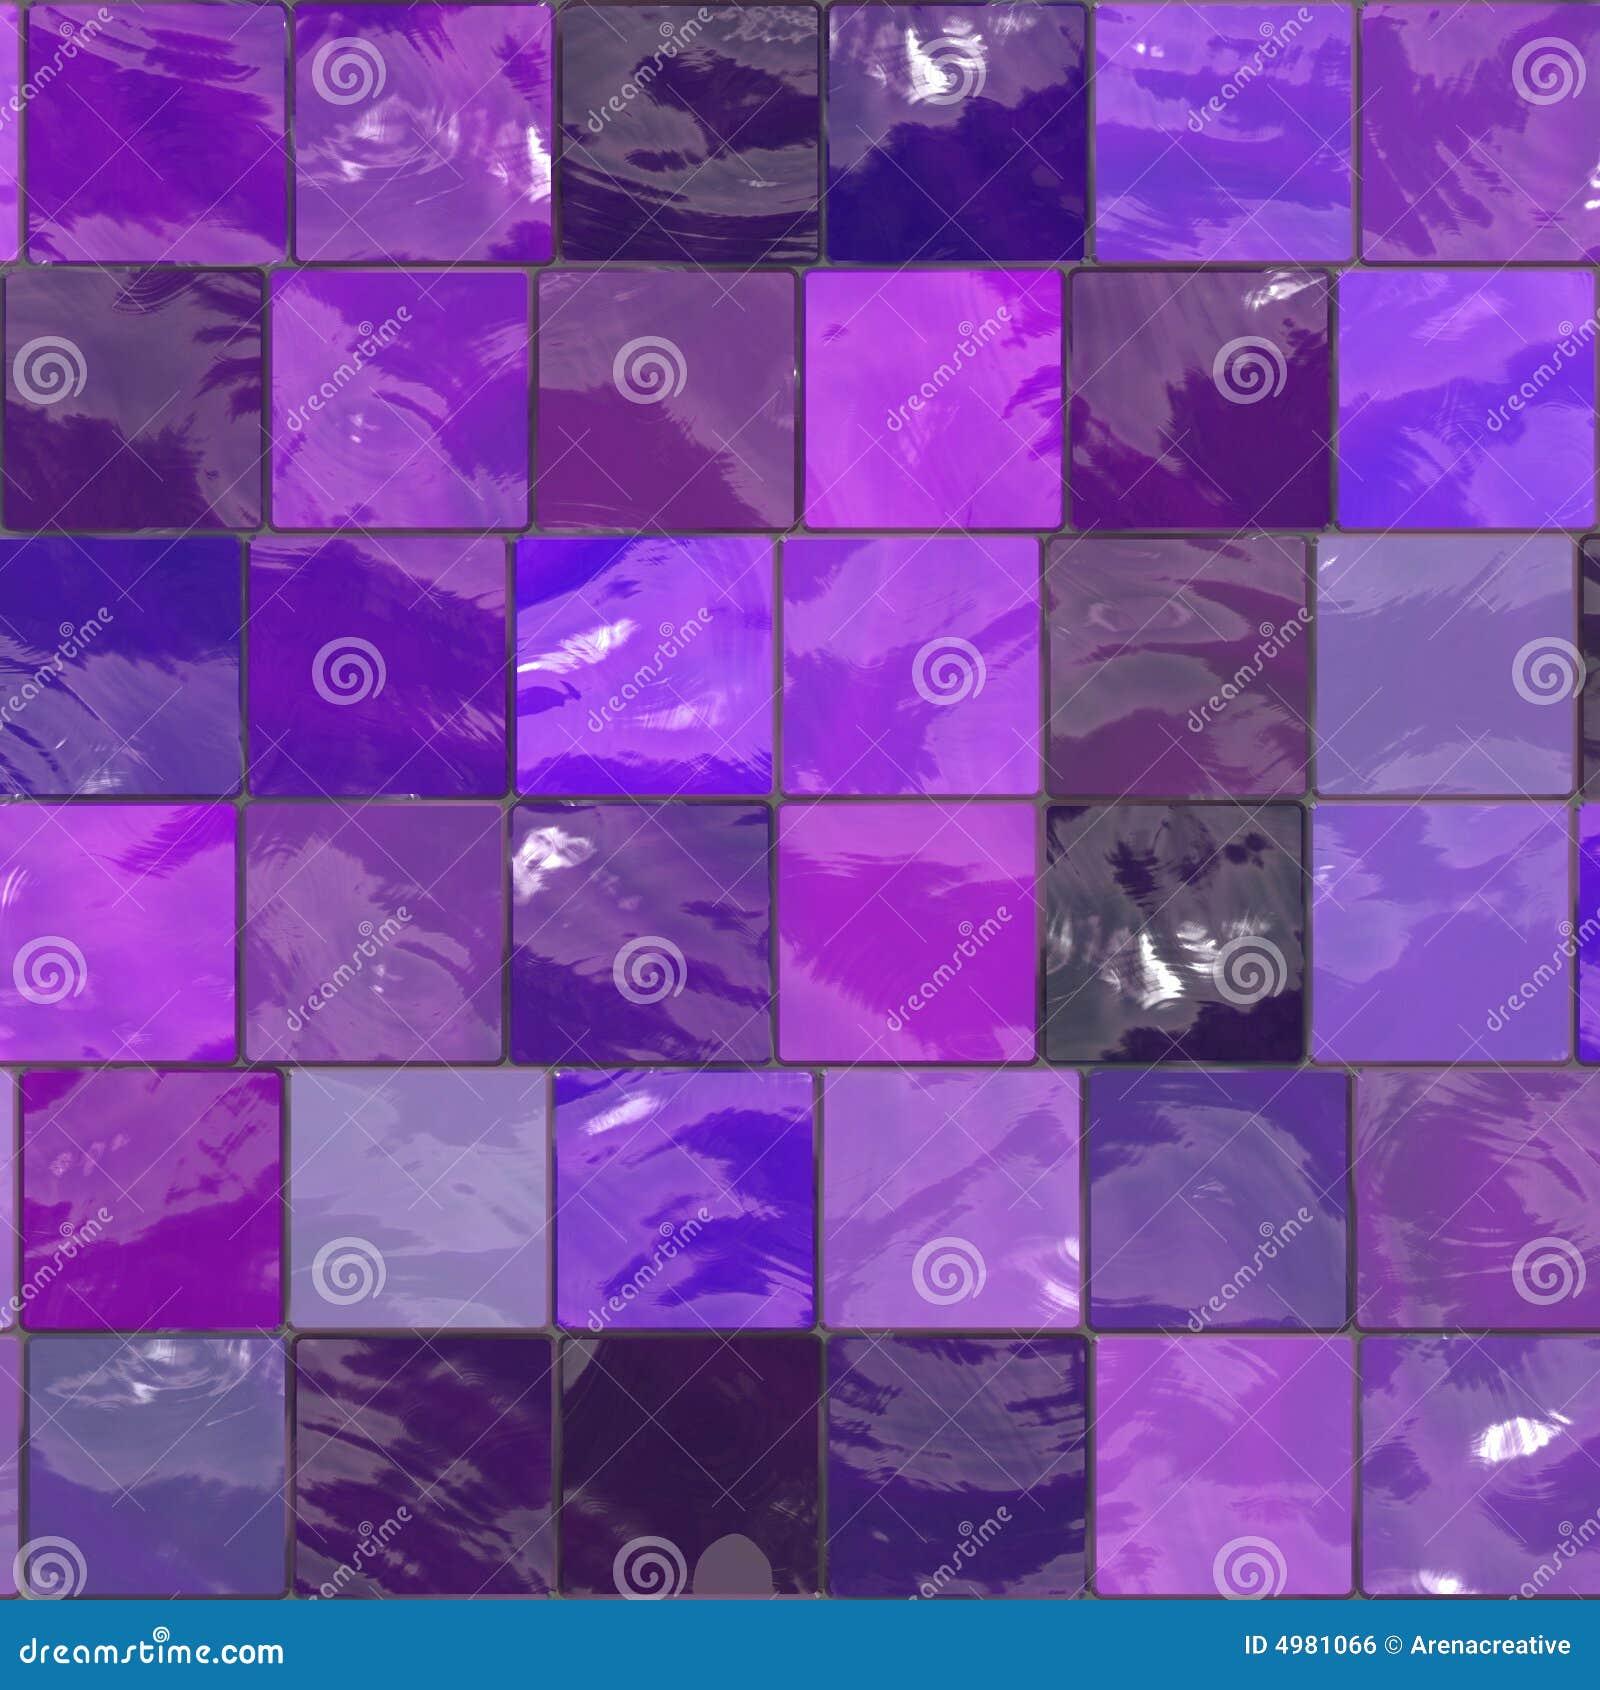 Free Bathroom Tiles Purple Bathroom Tiles Royalty Free Stock Image Image 4981066